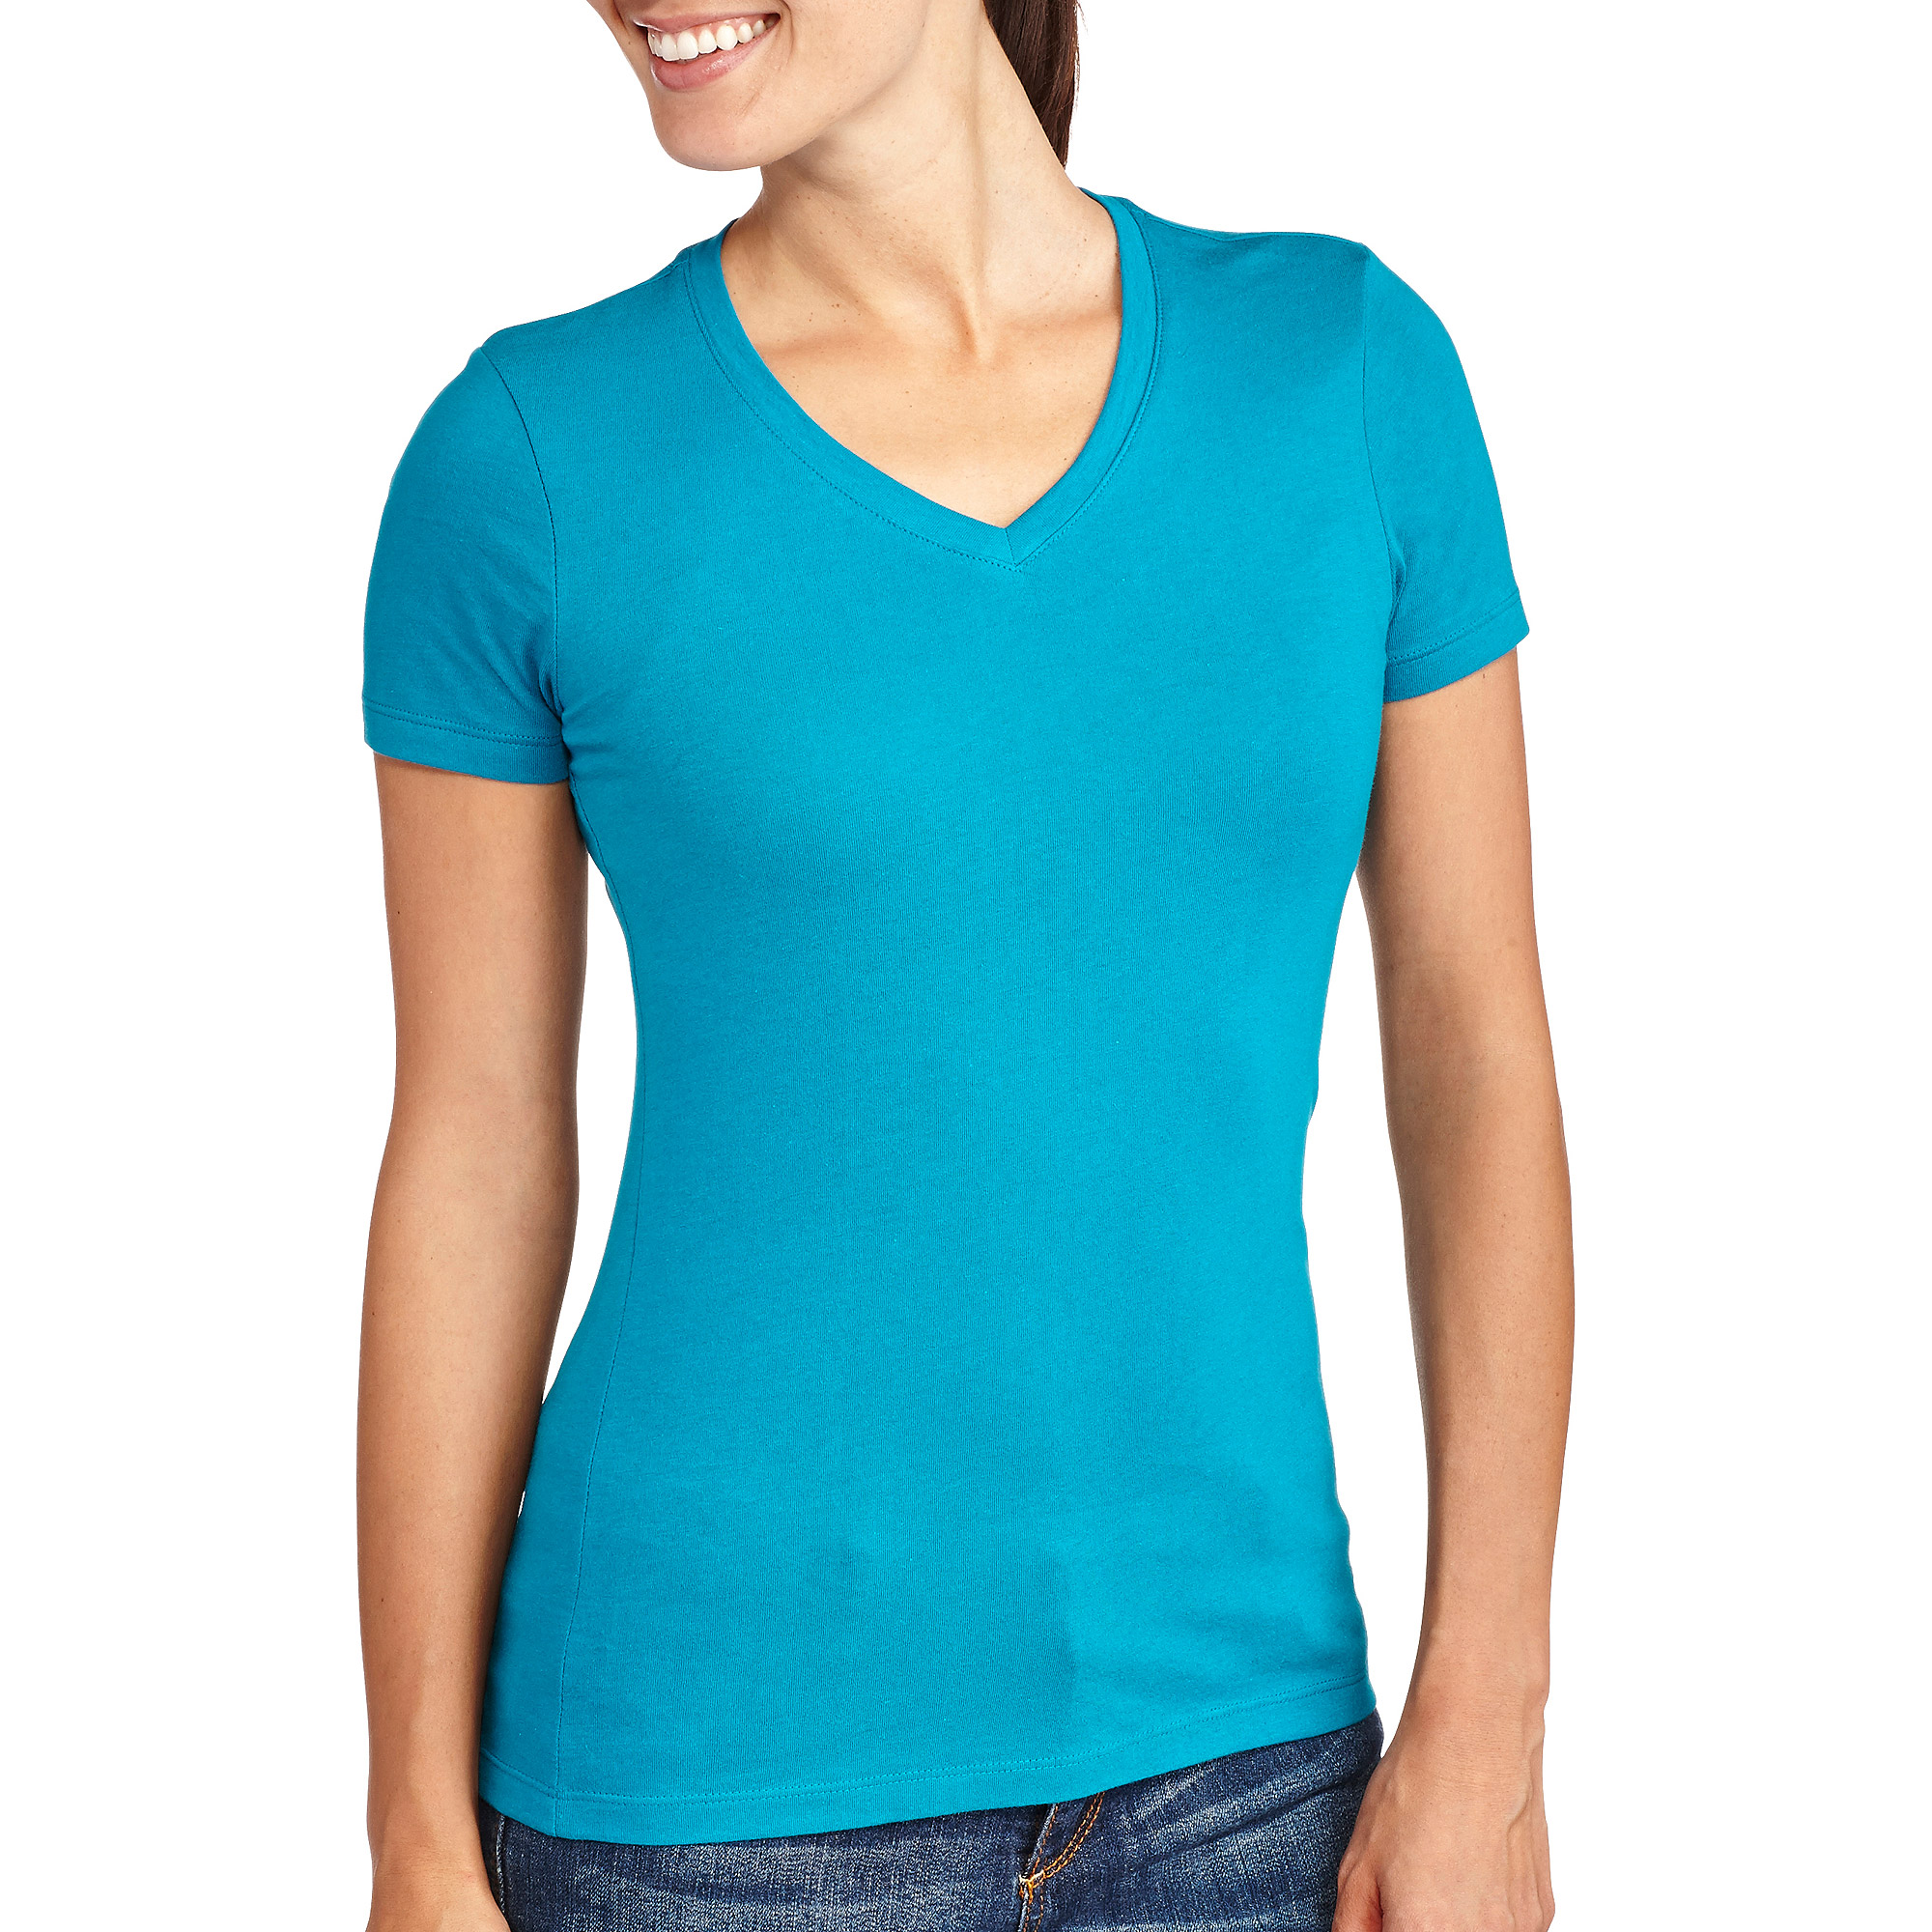 Faded Glory Women's V-Neck T-Shirt